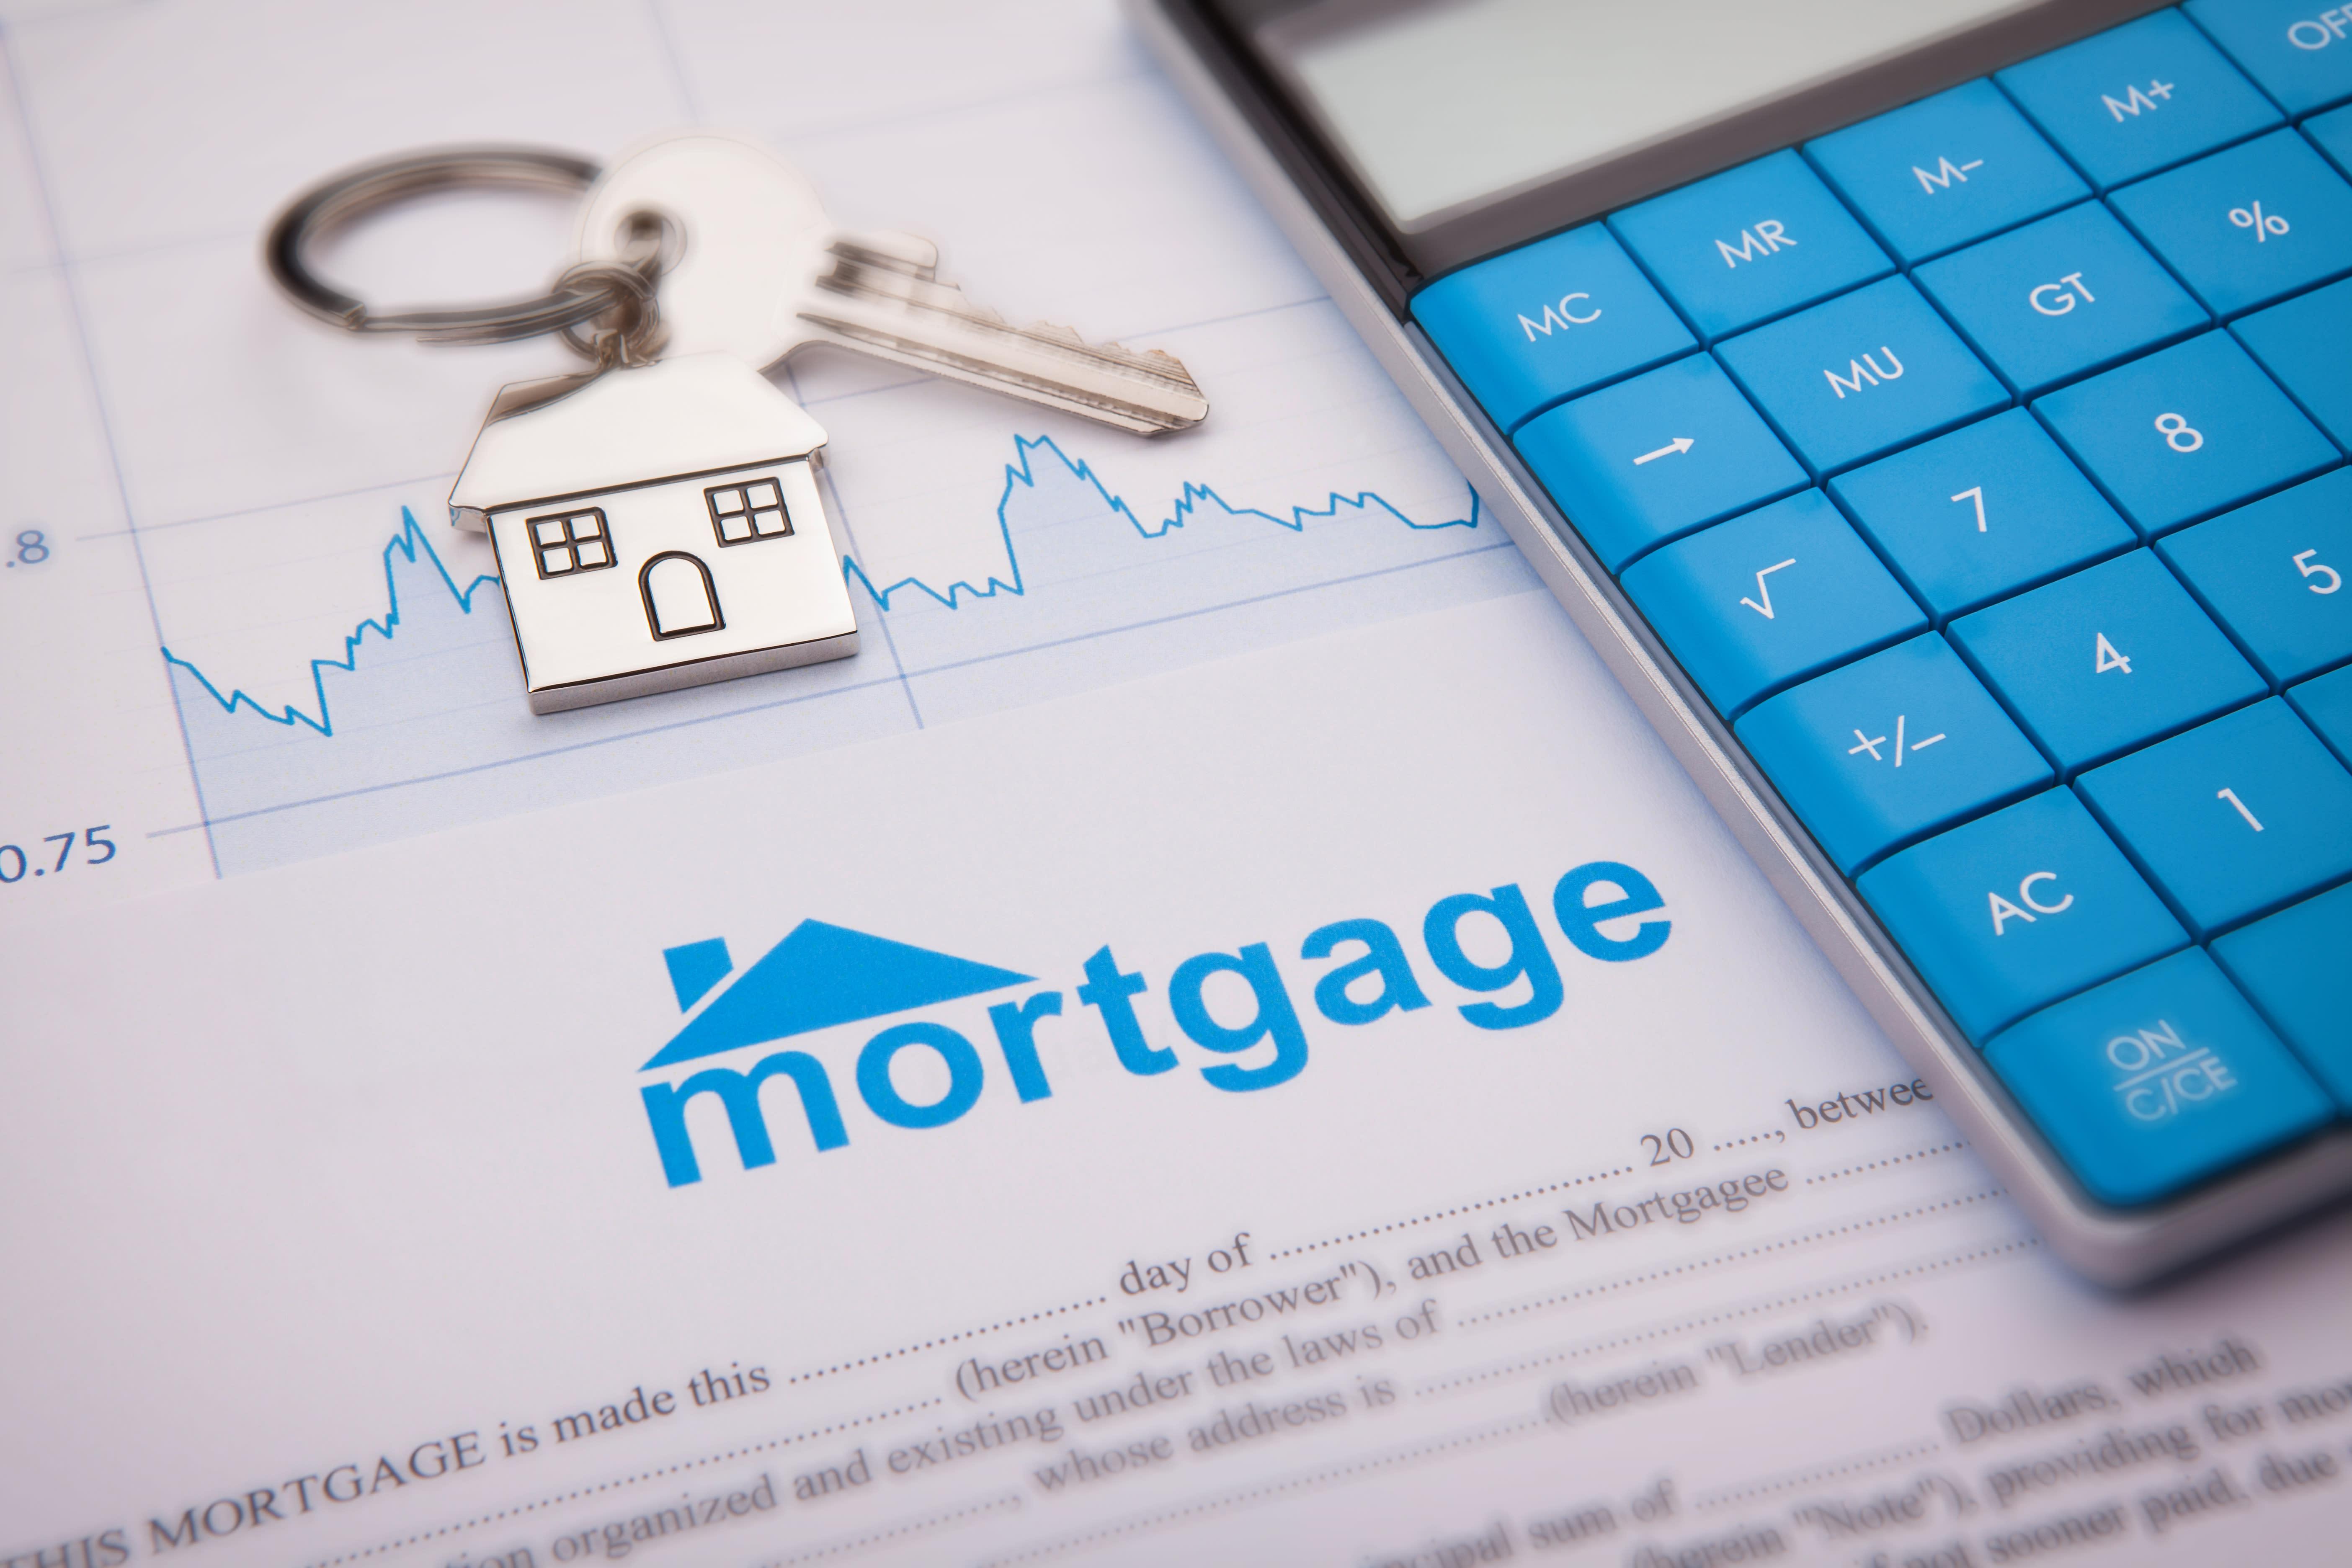 Fed's coronavirus response left mortgage market 'high and dry'